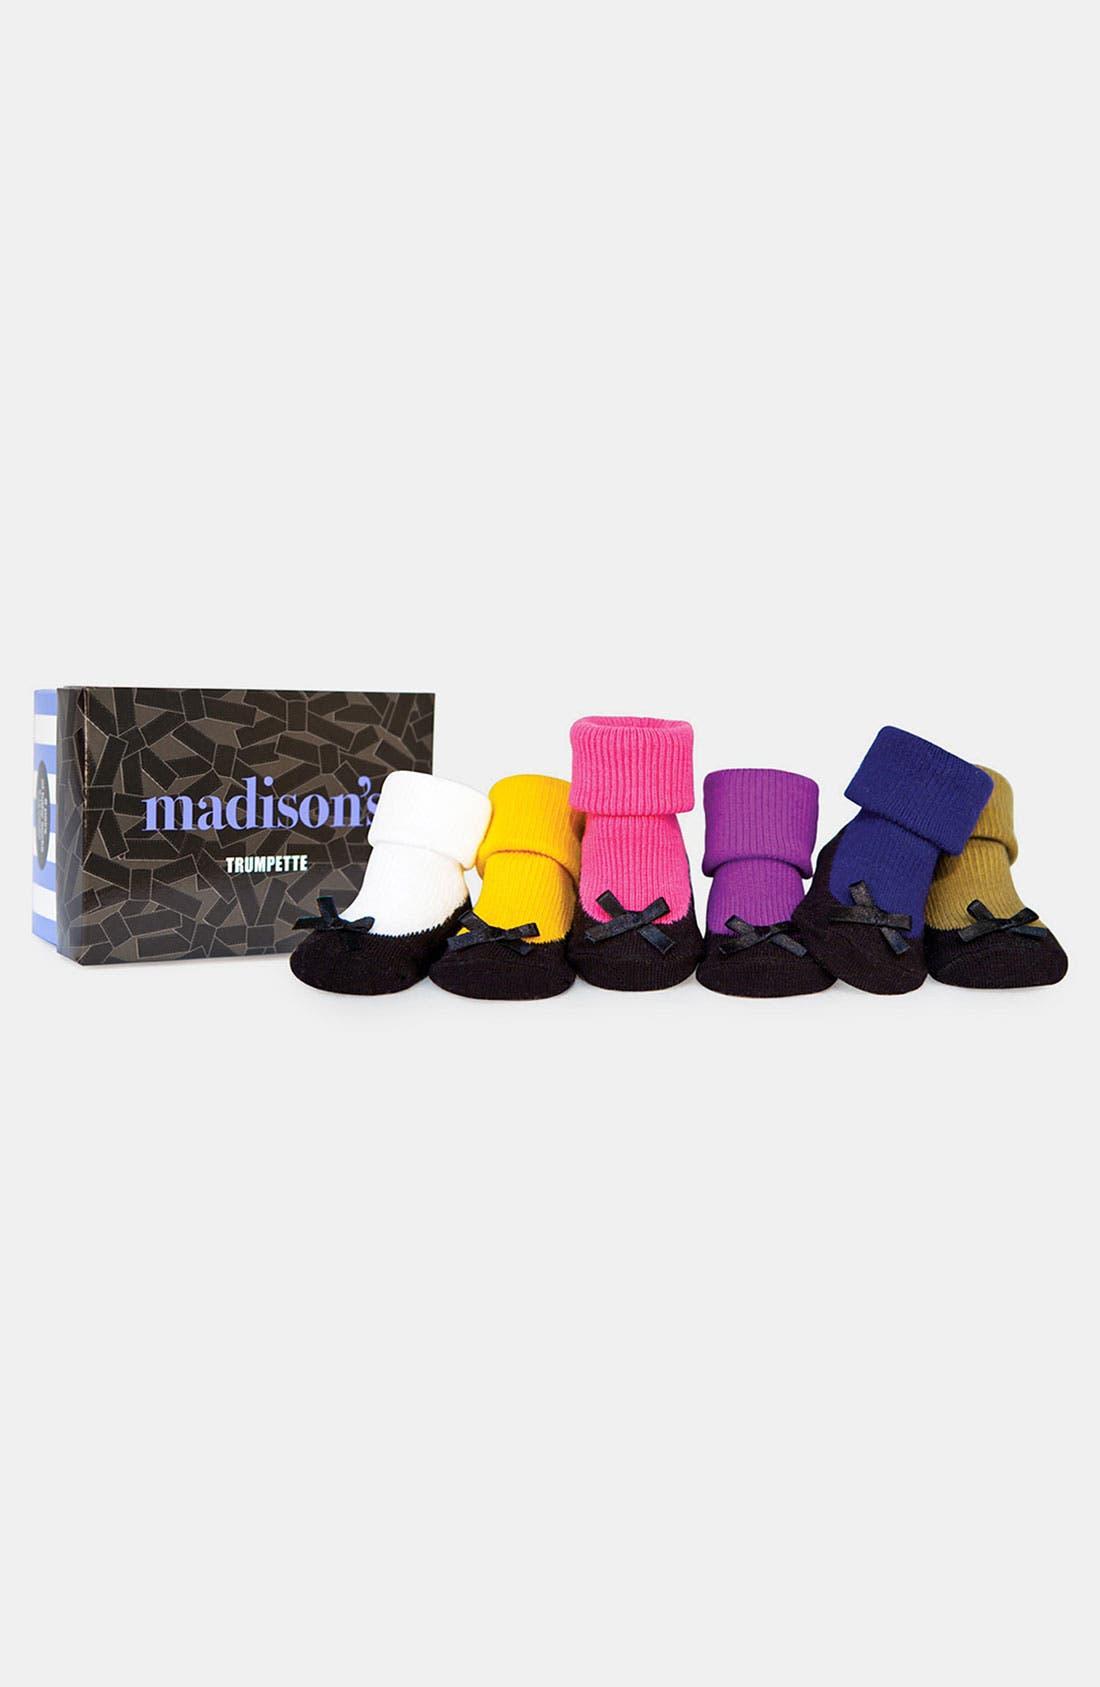 Alternate Image 1 Selected - Trumpette 'Madison's' Socks (6-Pack)(Baby Girls)